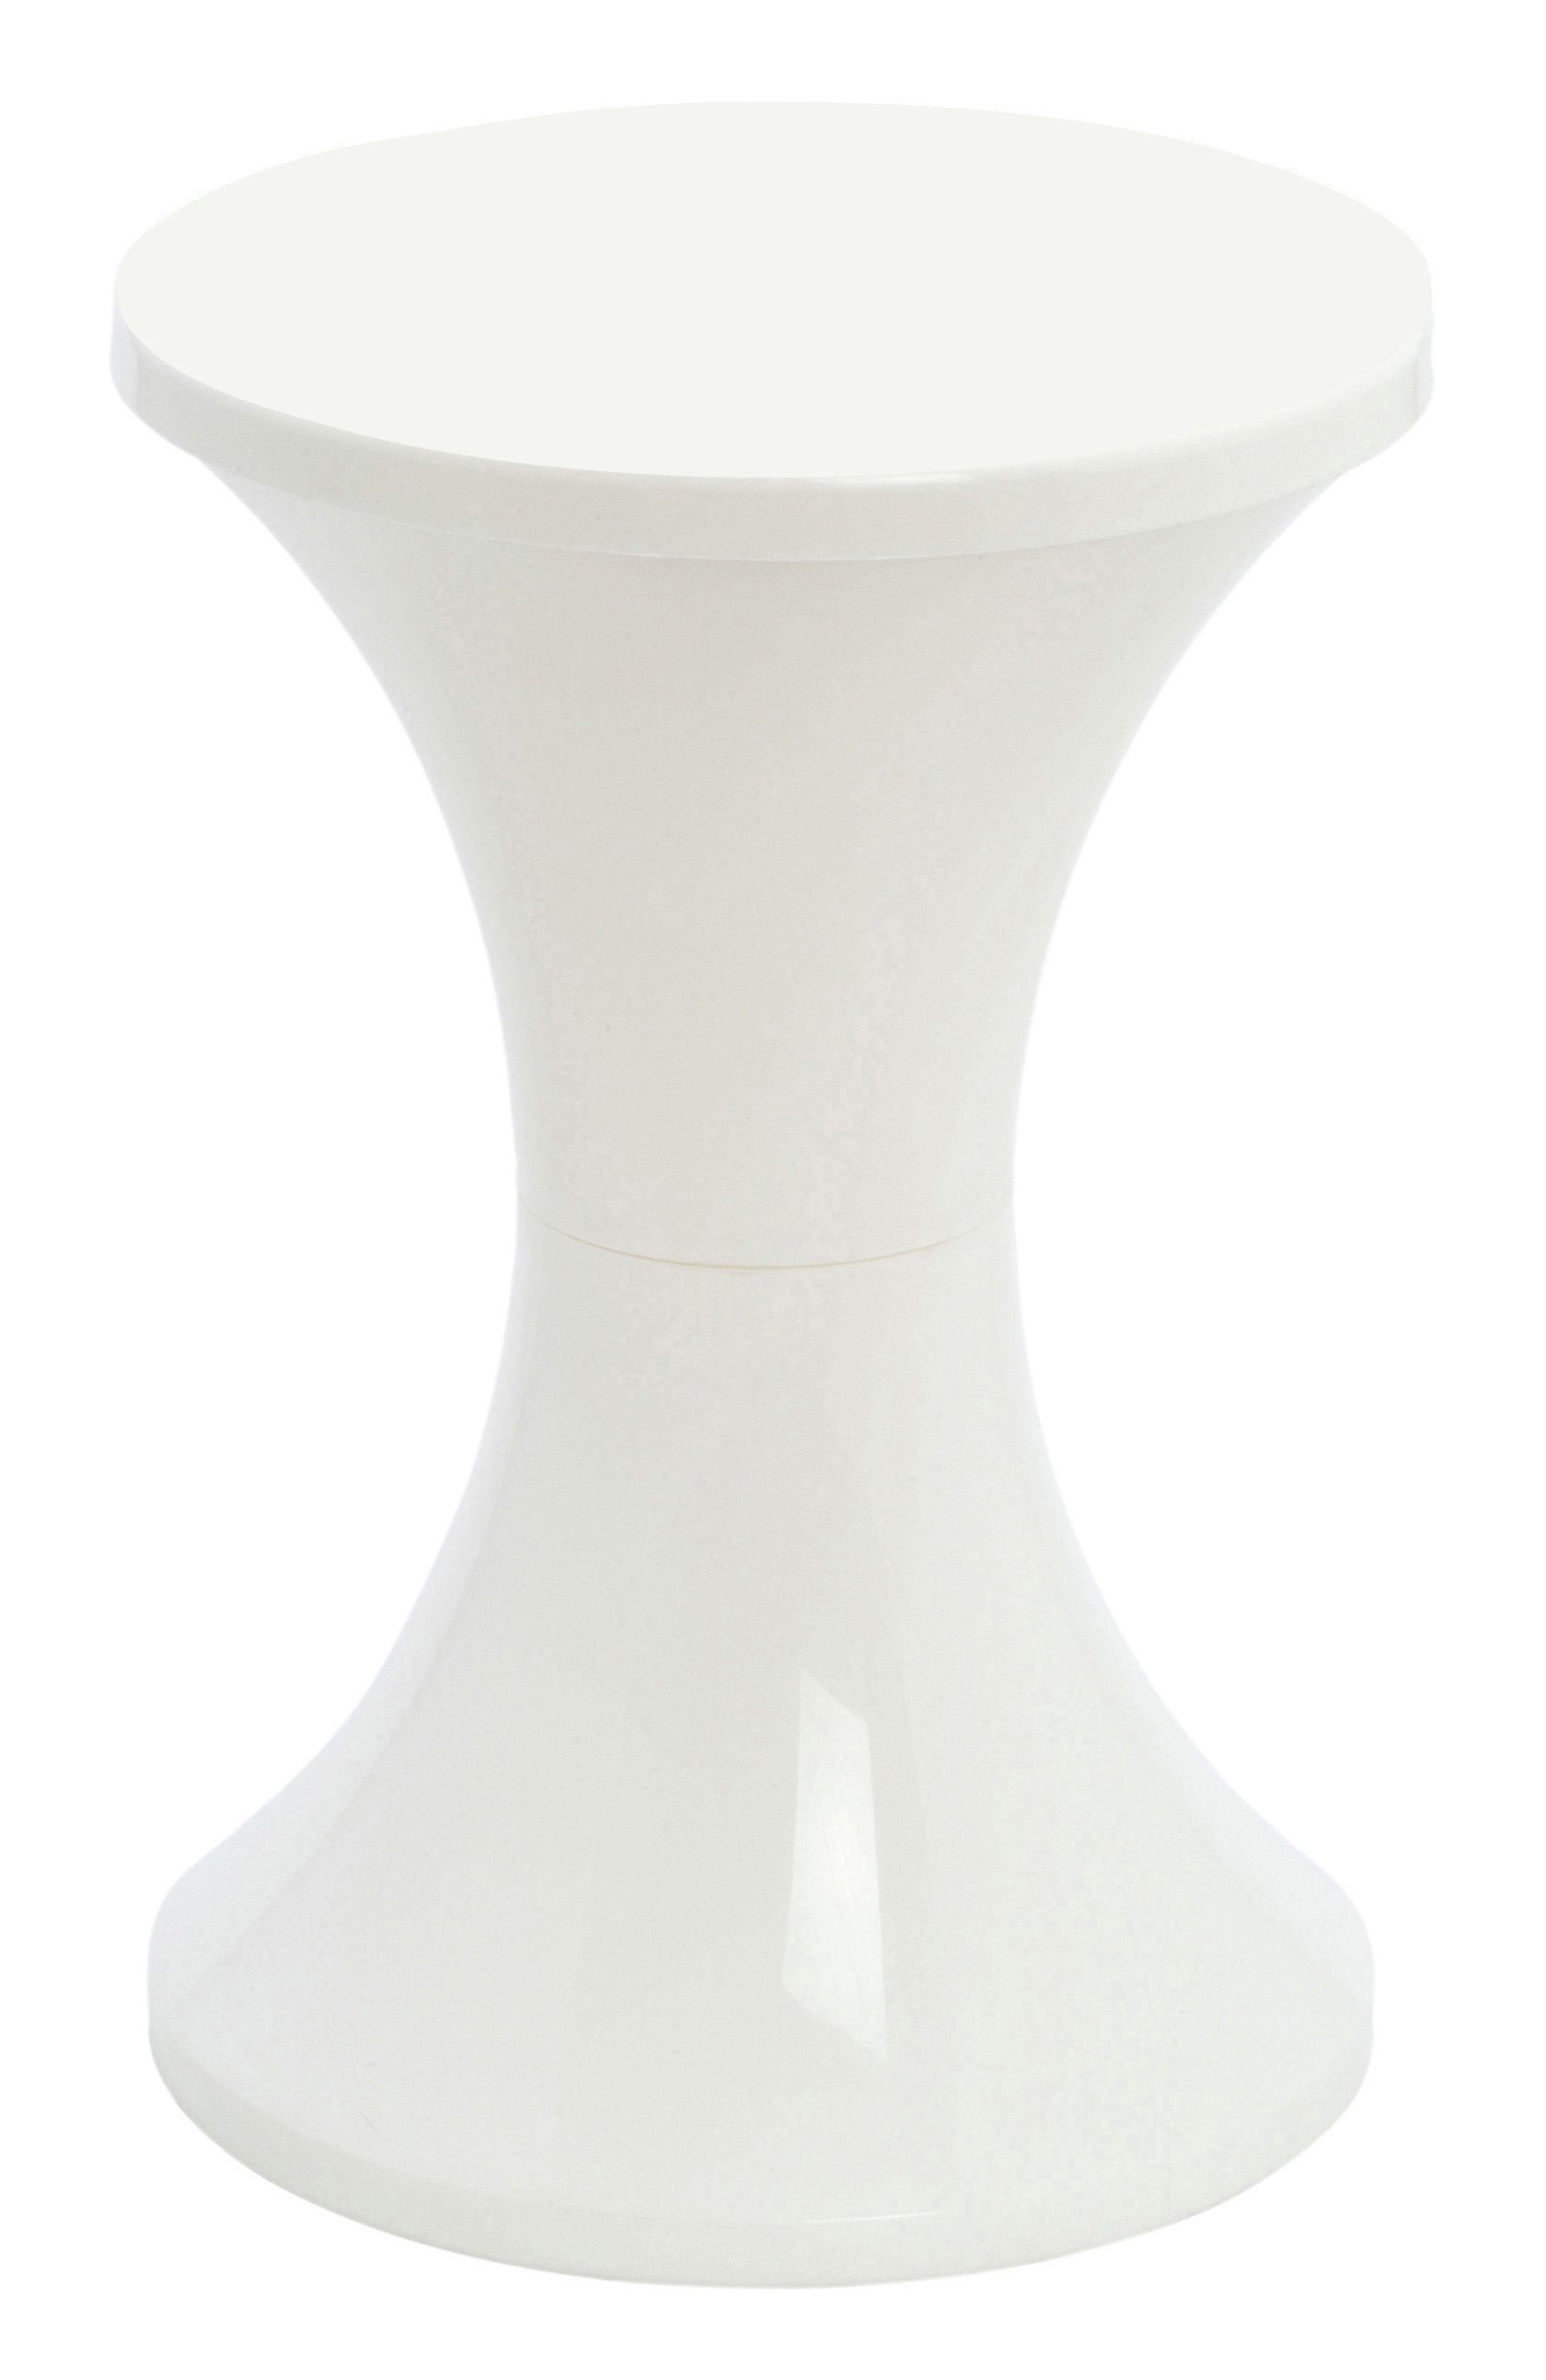 Furniture - Teen furniture - Tam Tam Pop Stool by Stamp Edition - White - Polypropylene